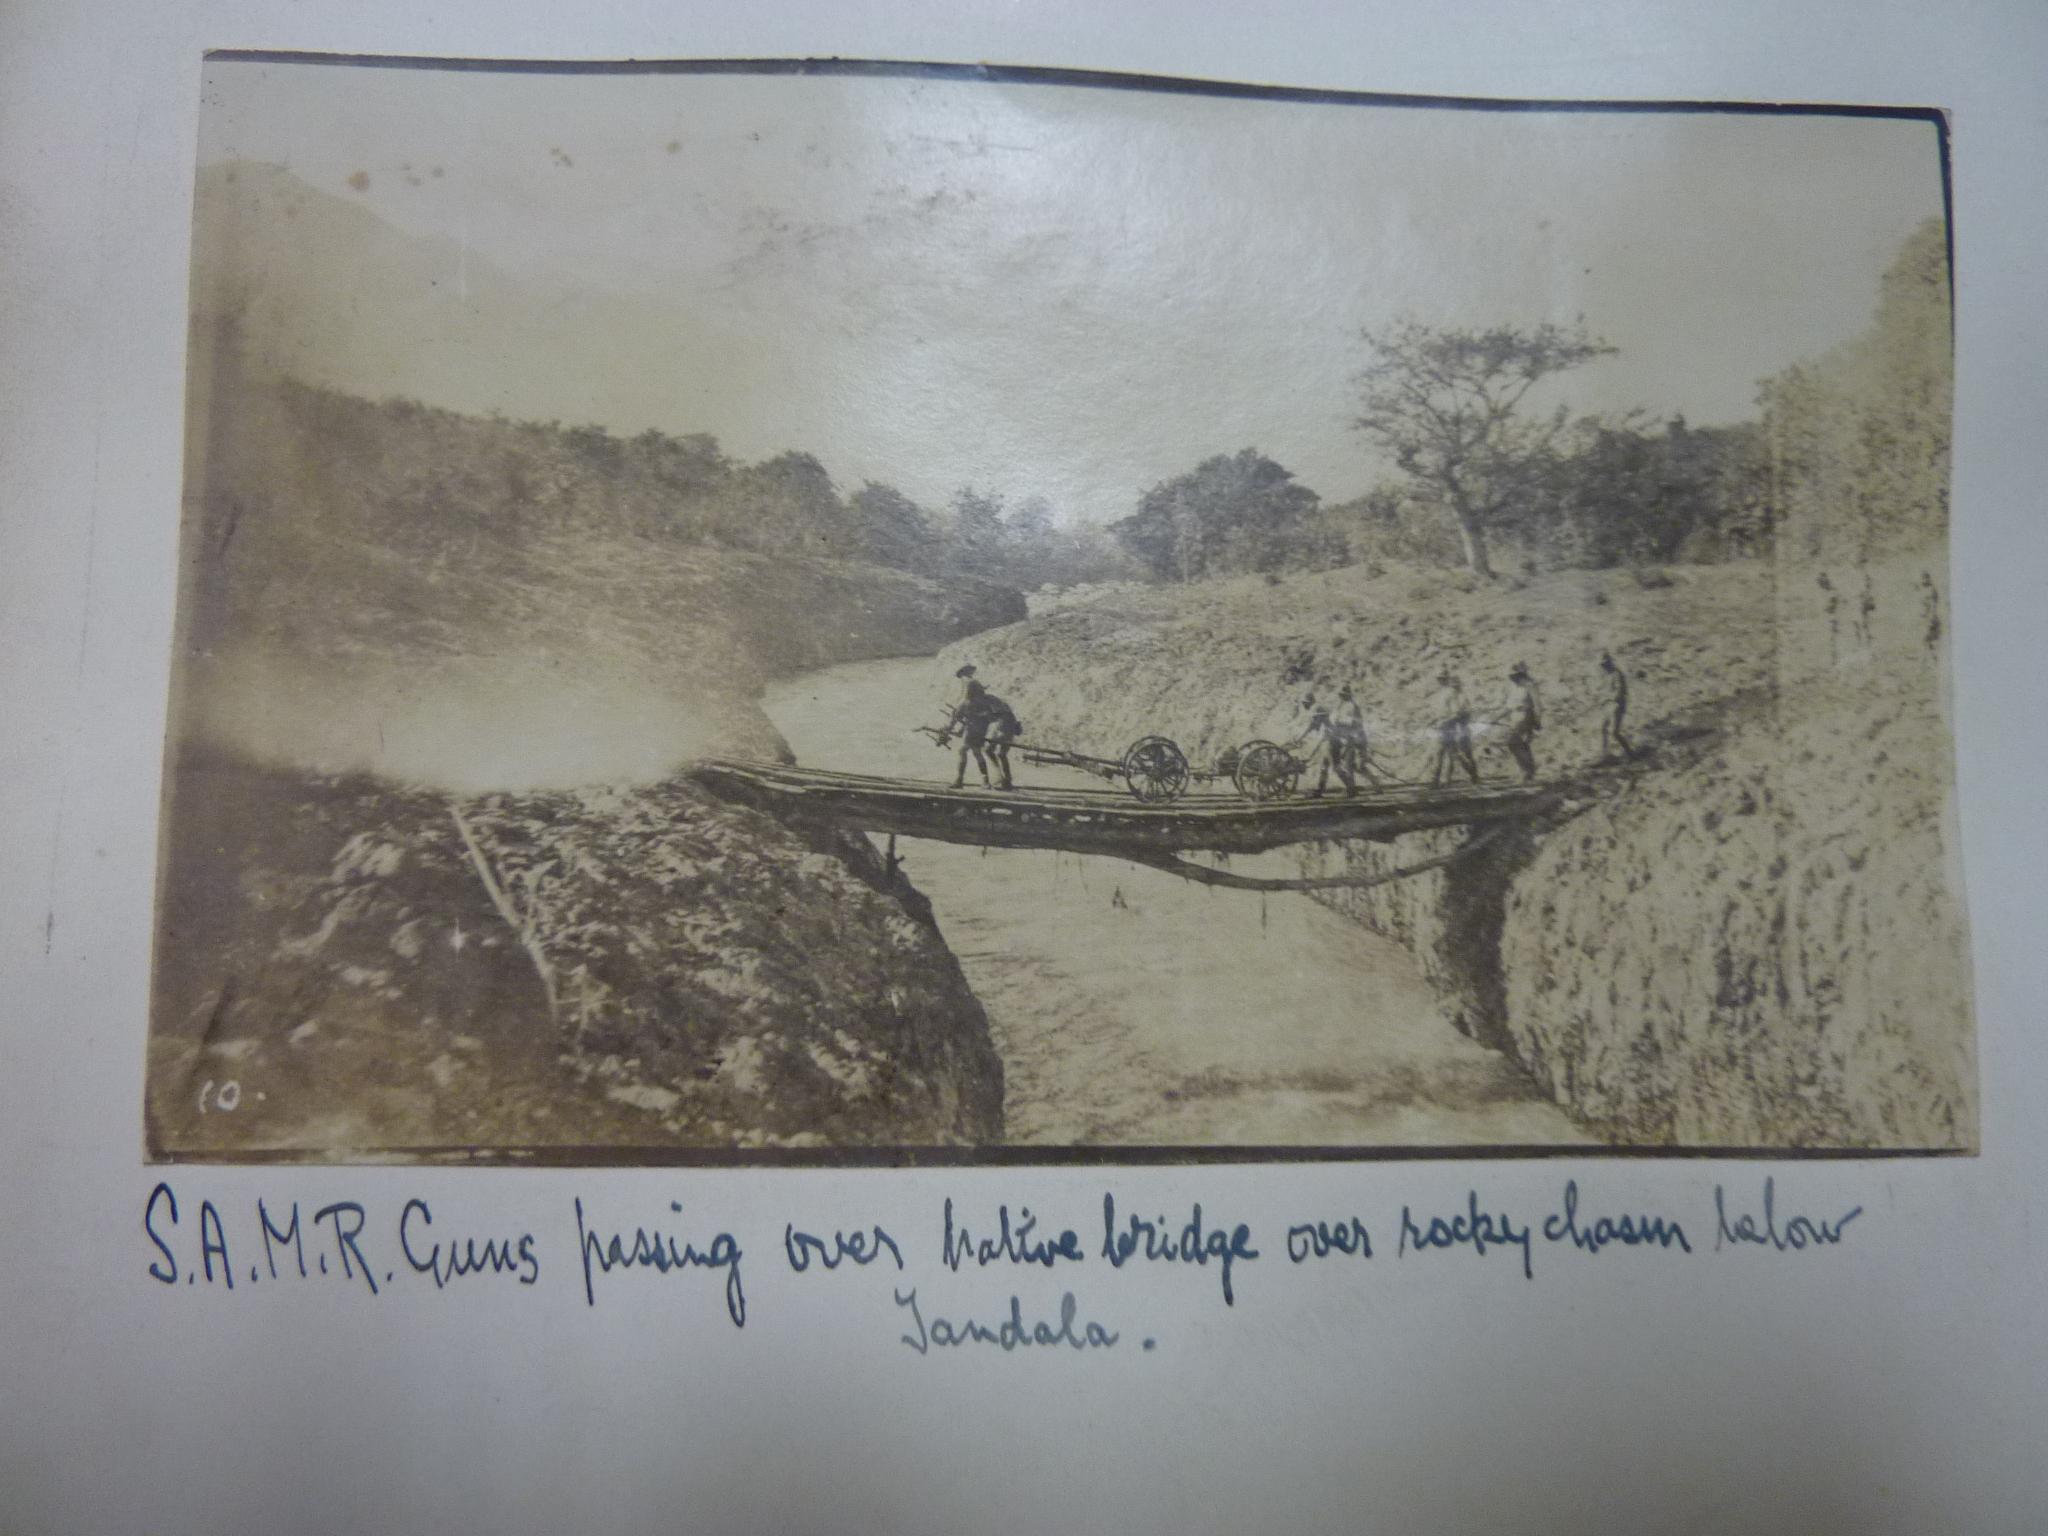 SAMR river crossing